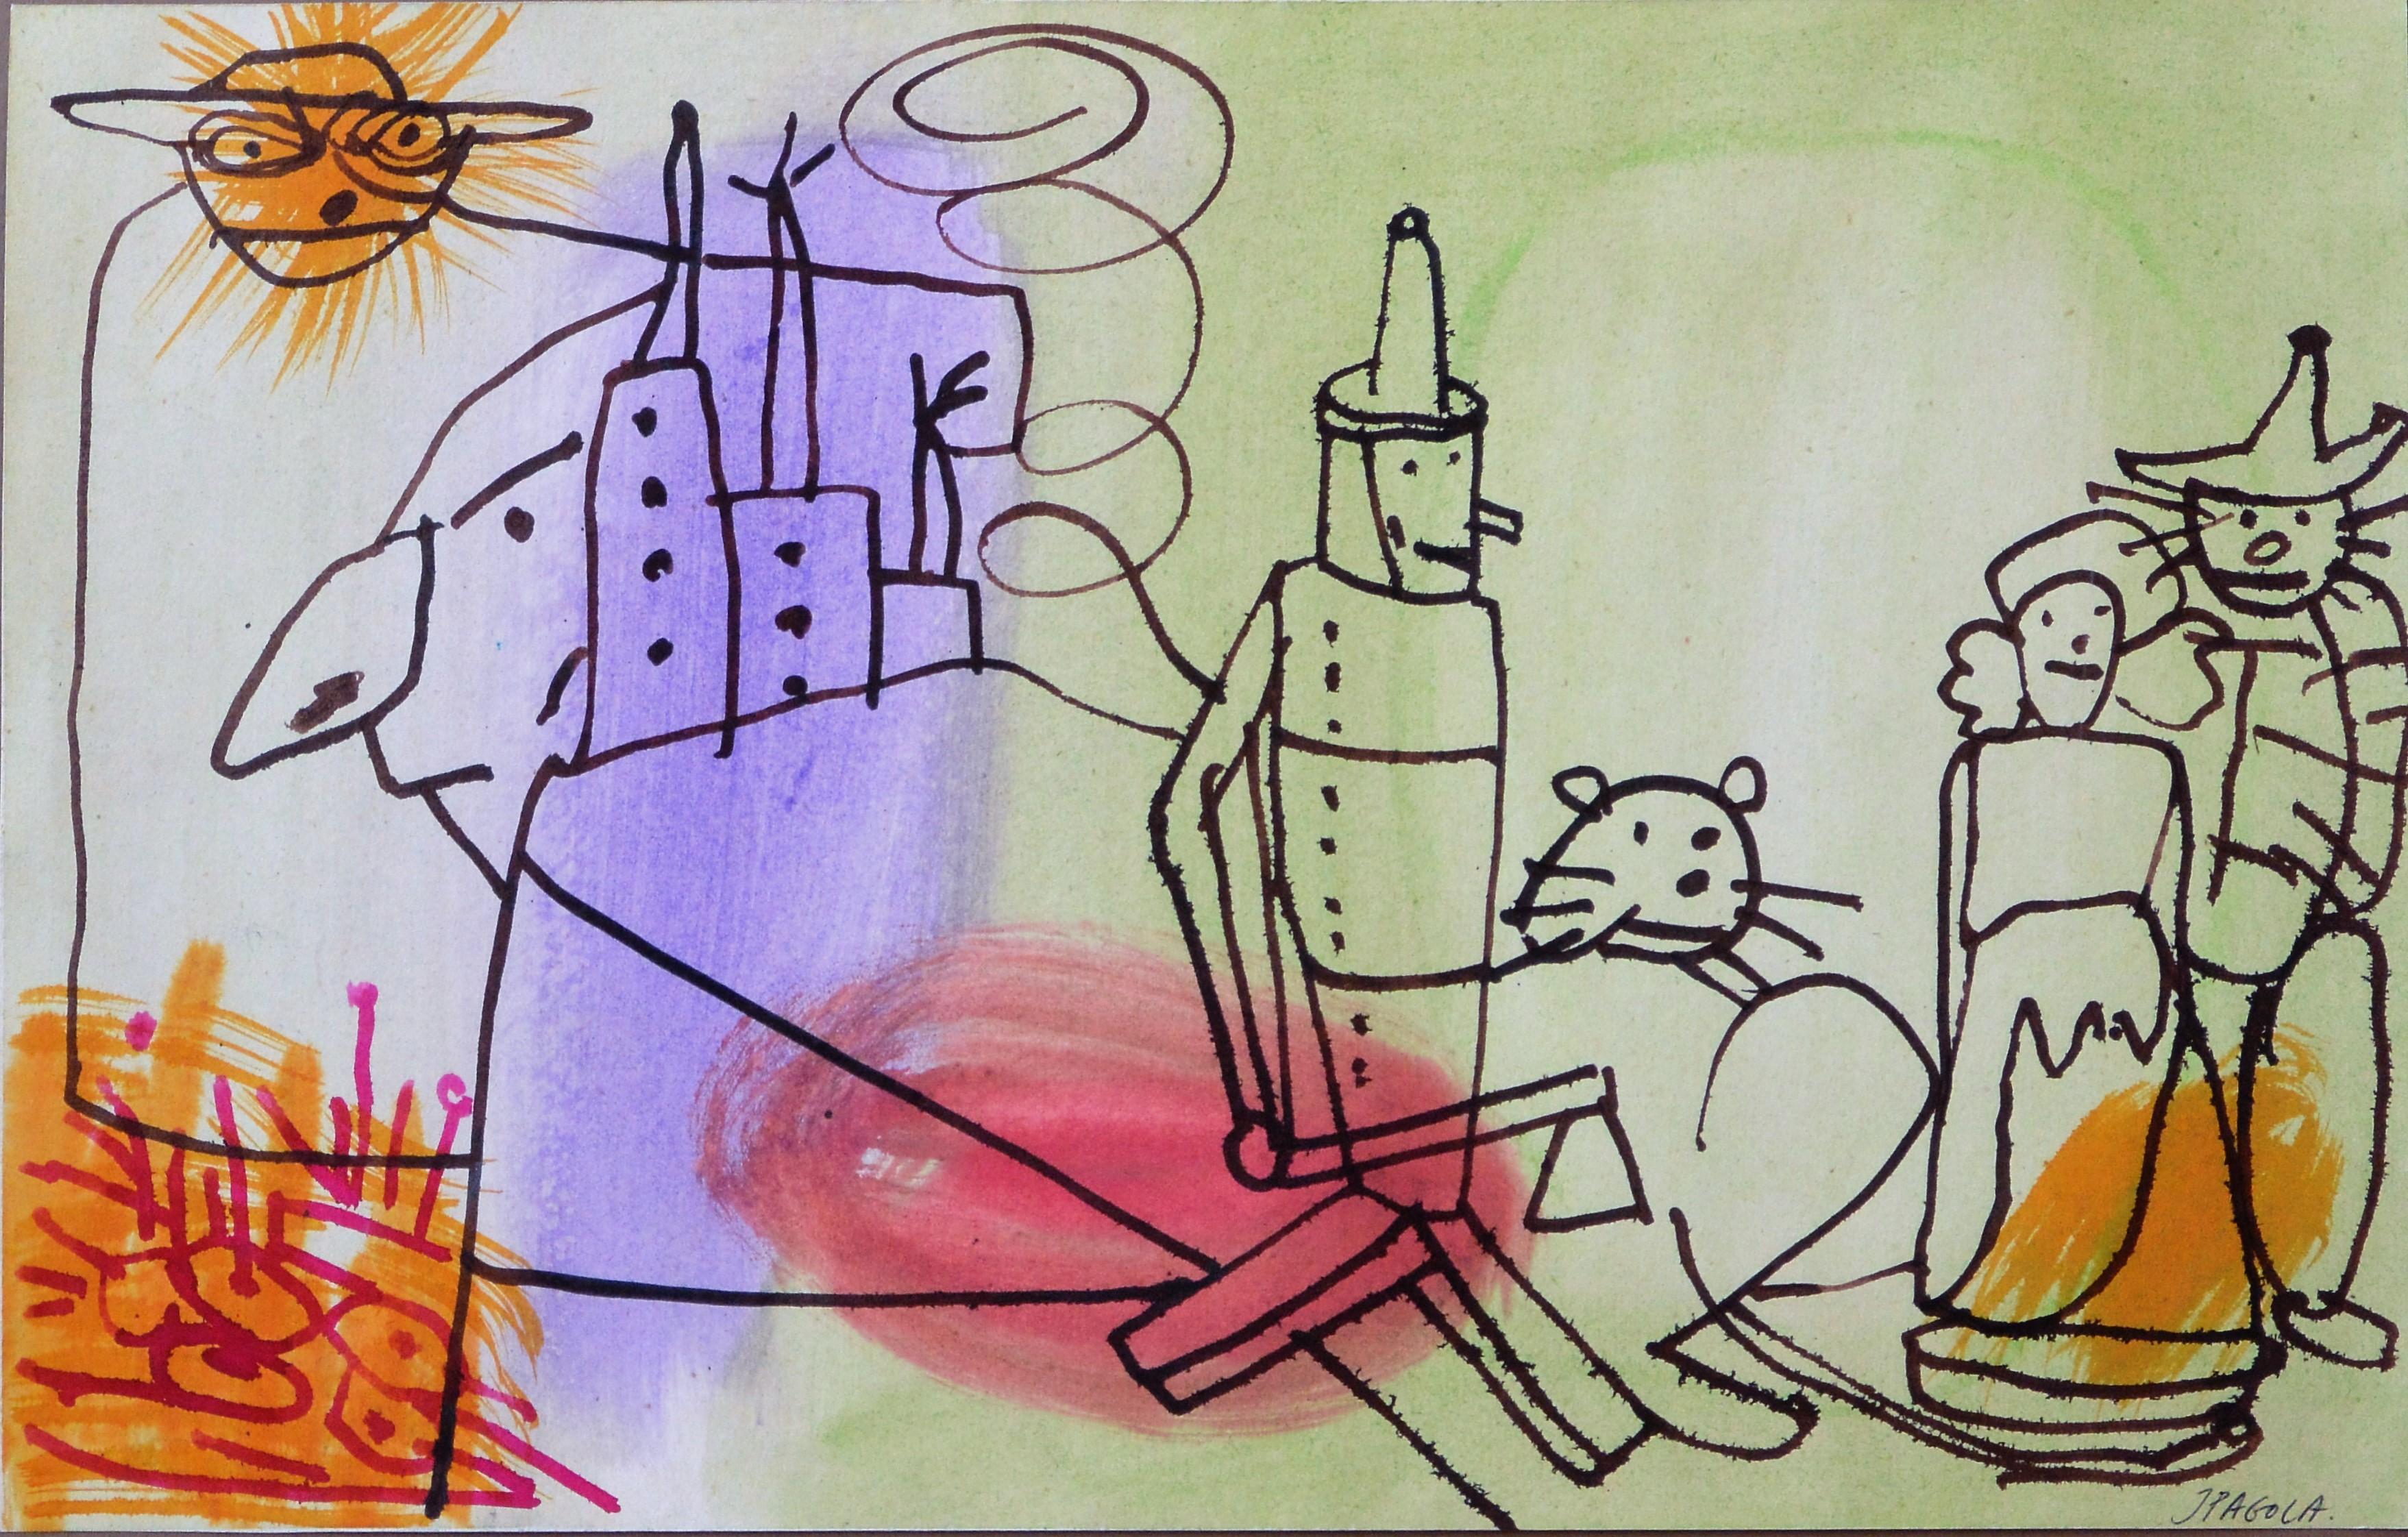 Pagola Javier  Personajes de El Mago de Oz dibujo tcnica mixta